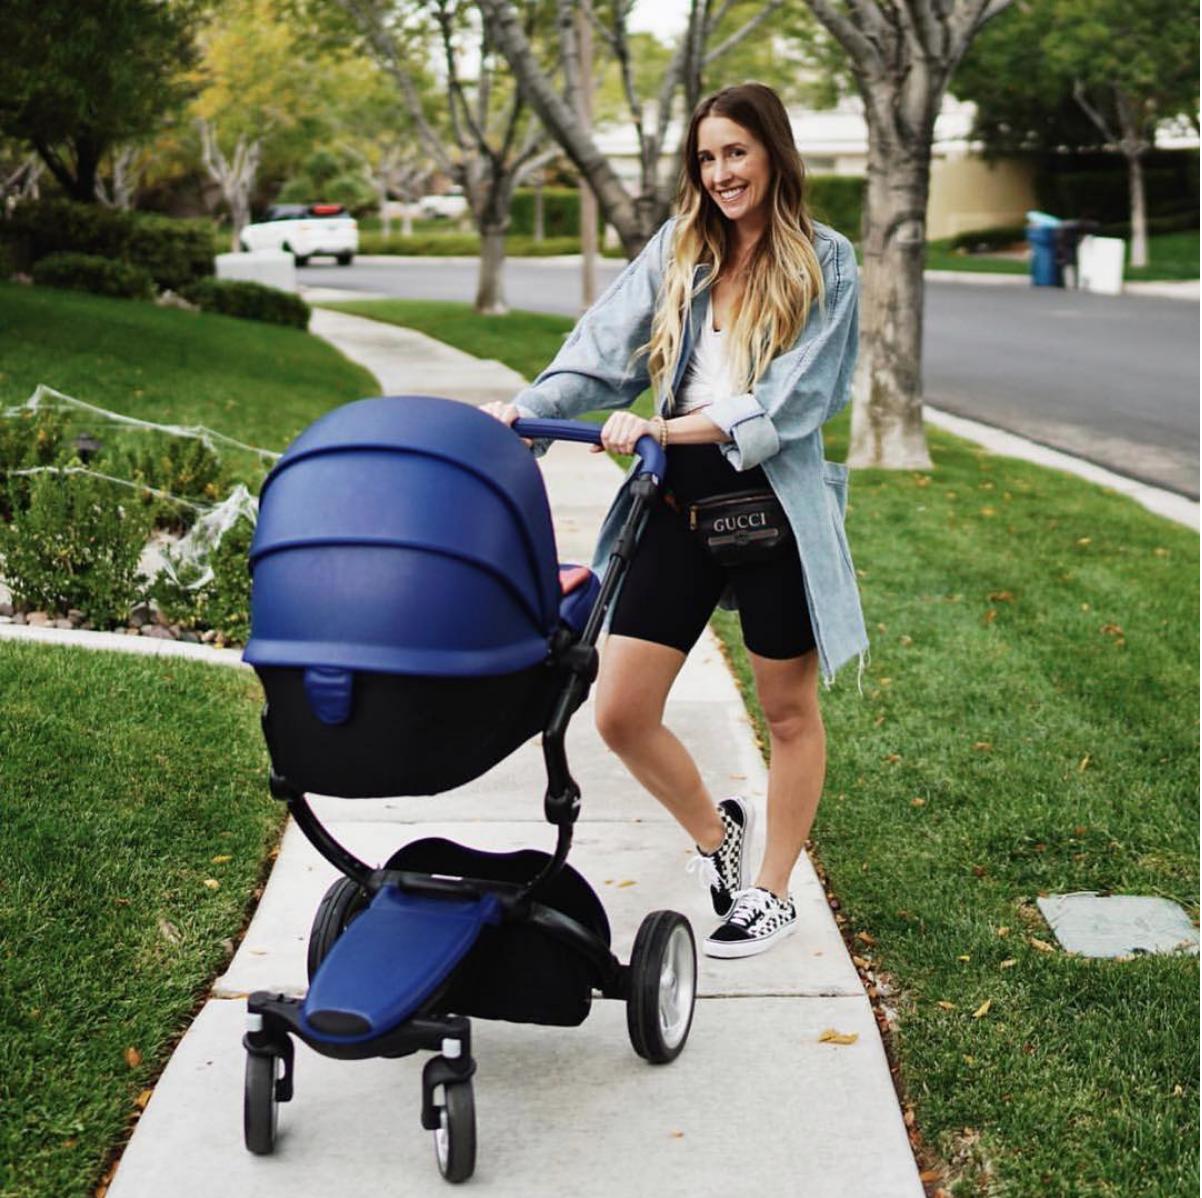 Mima Xari 4G Best baby strollers, Baby strollers, Mima xari